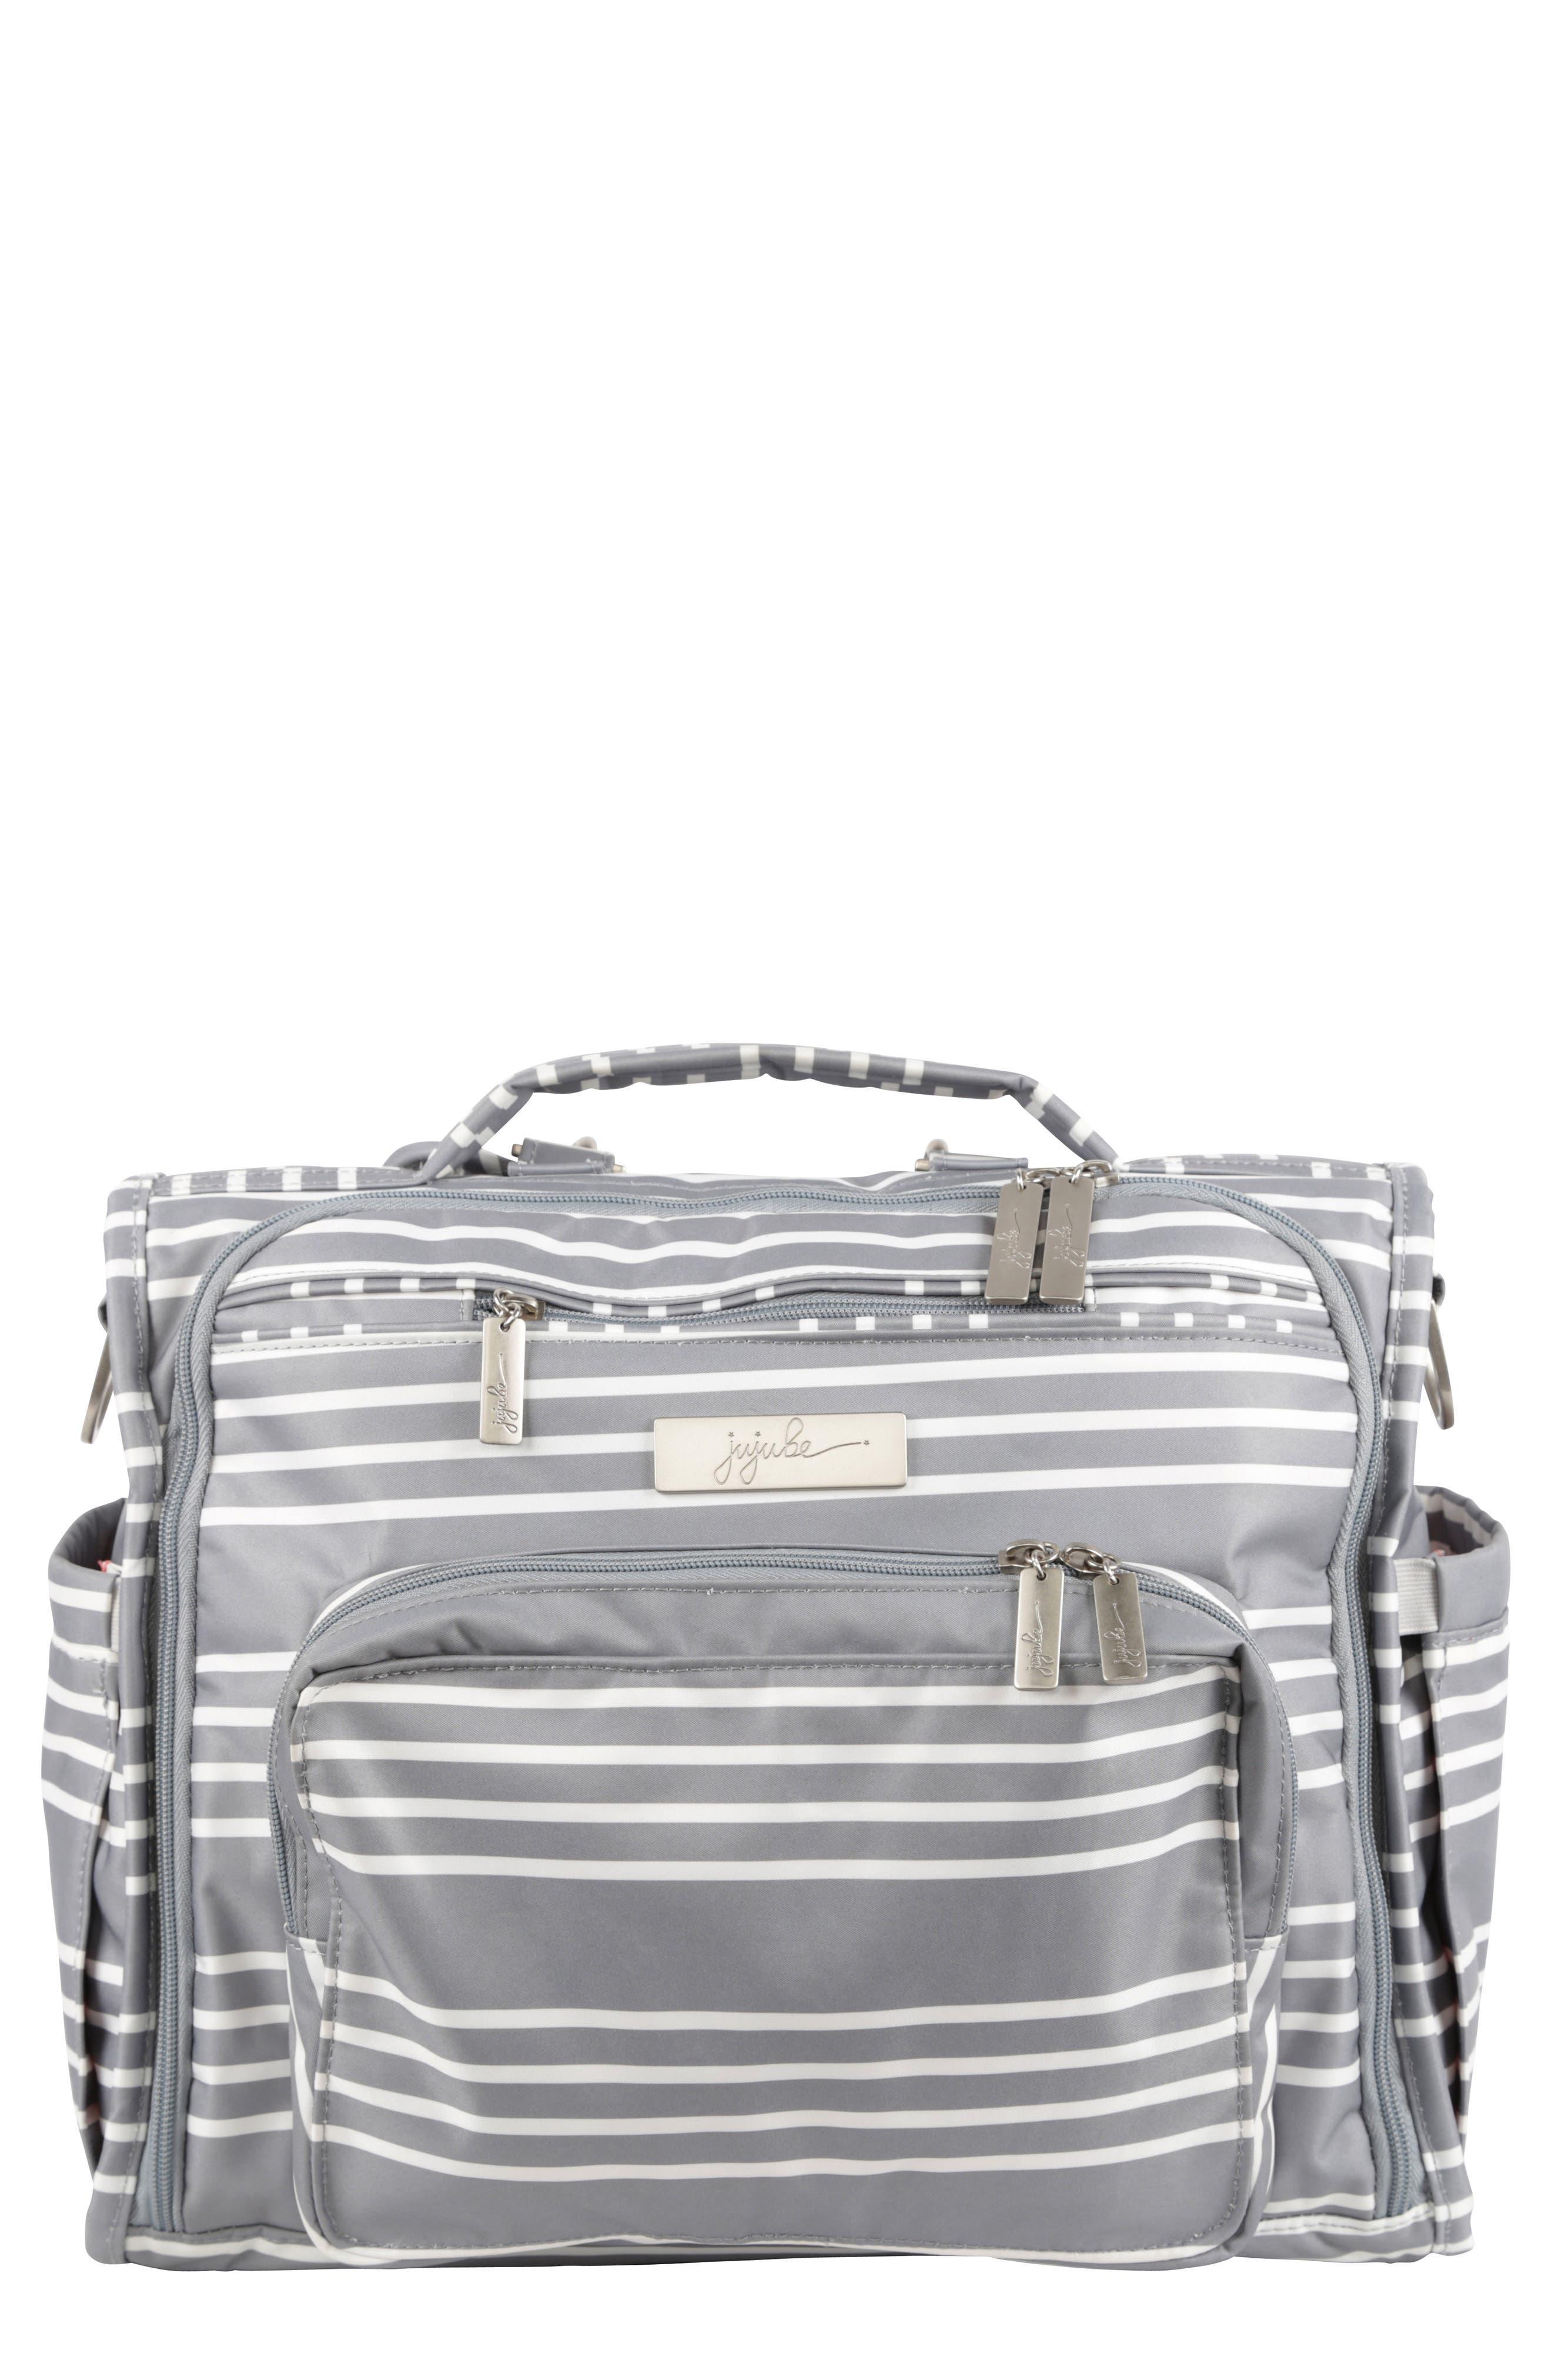 BFF - Coastal Collection Diaper Bag,                         Main,                         color, 042